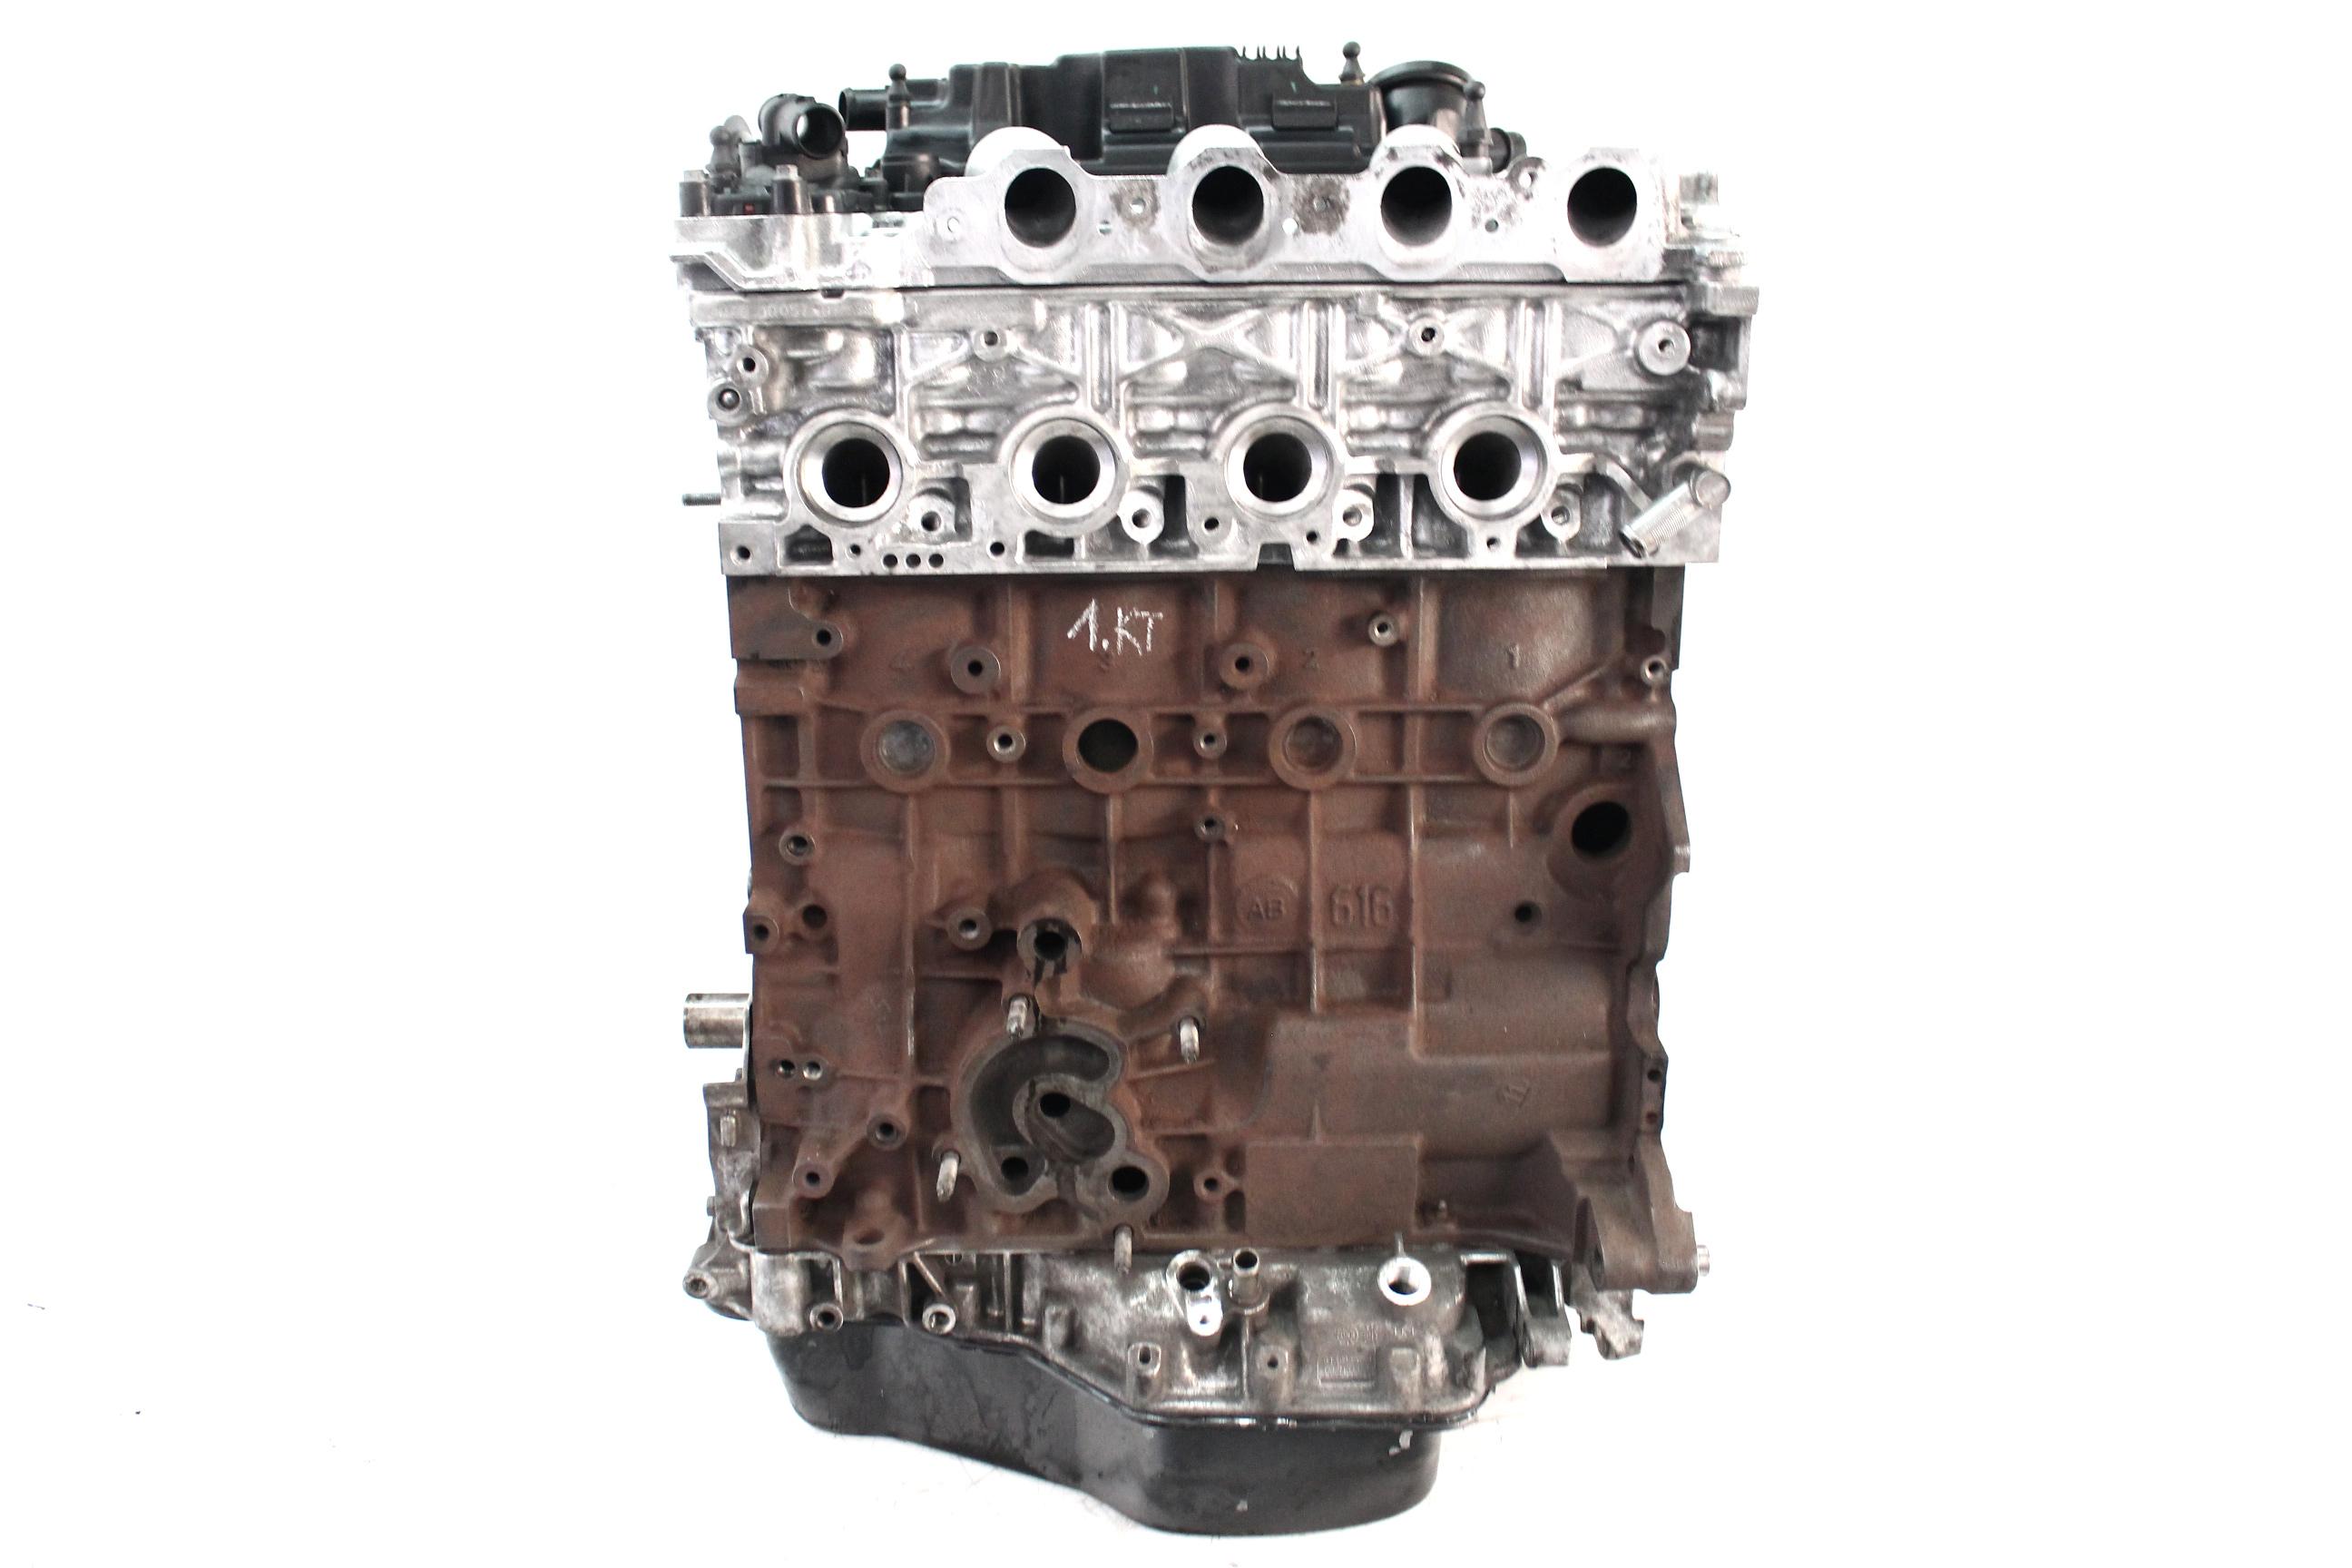 Motor Citroen Peugeot C-Crosser 4007 2,2 HDi Diesel 4HN DW12MTED4